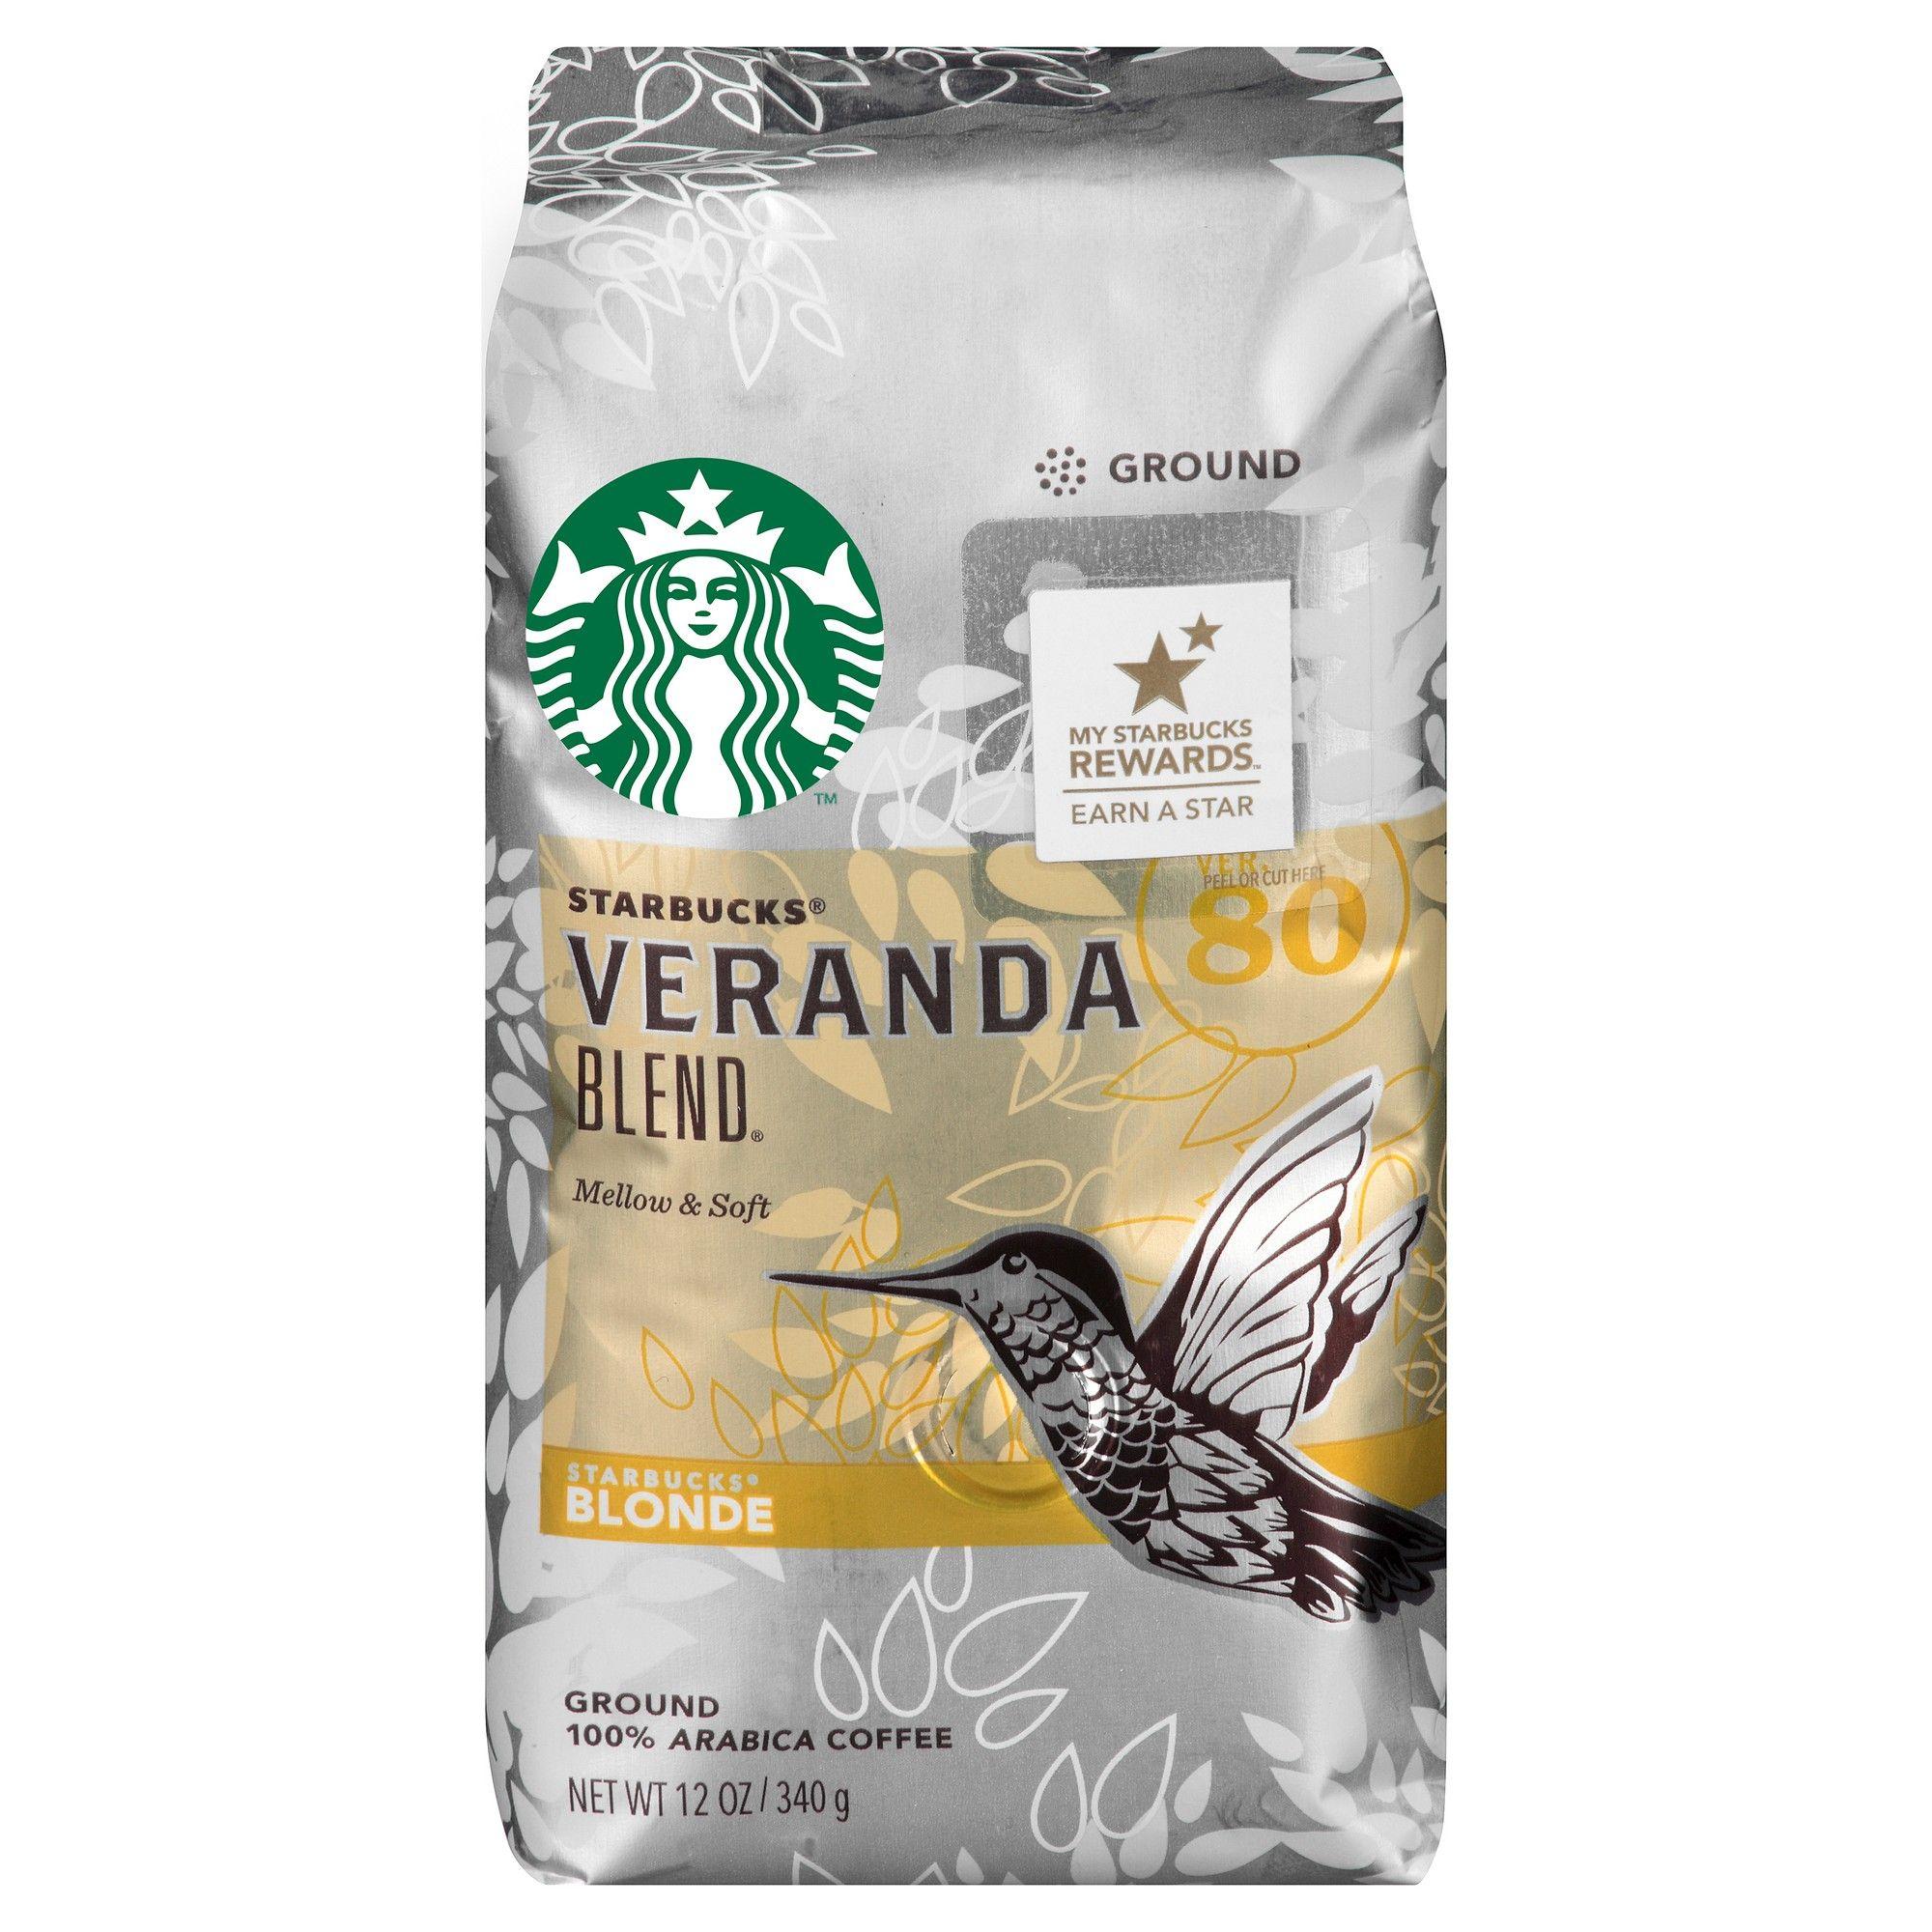 Starbucks Veranda Blend Blonde Ground Coffee 12oz